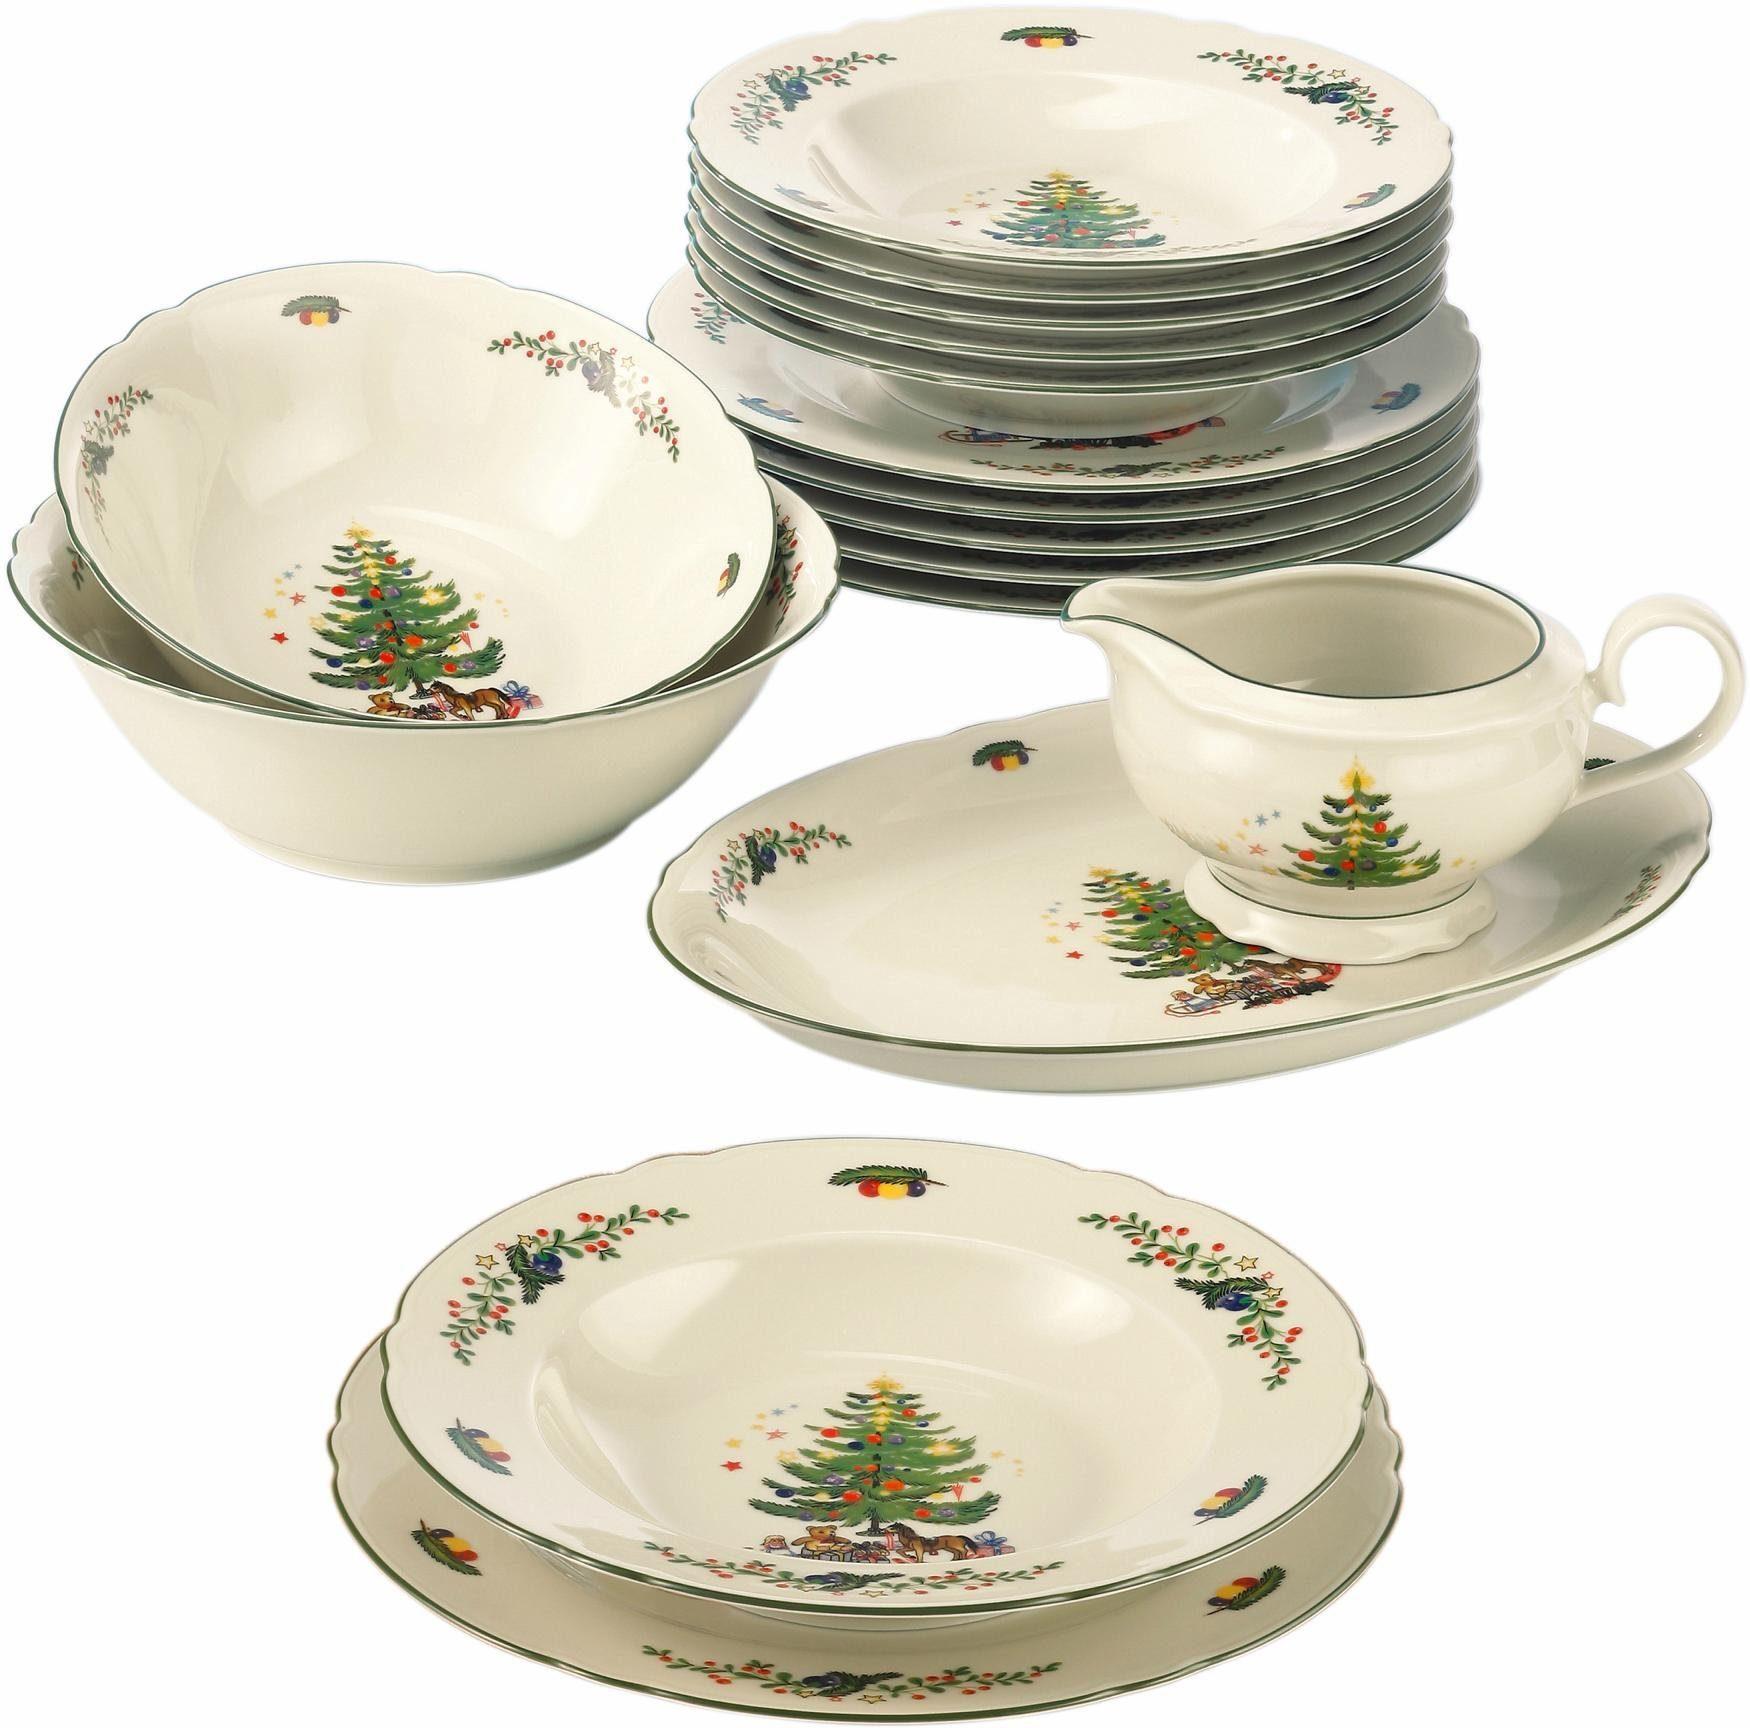 Seltmann Weiden Tafelservice, Porzellan, 16 Teile, »Marieluise Weihnachten«